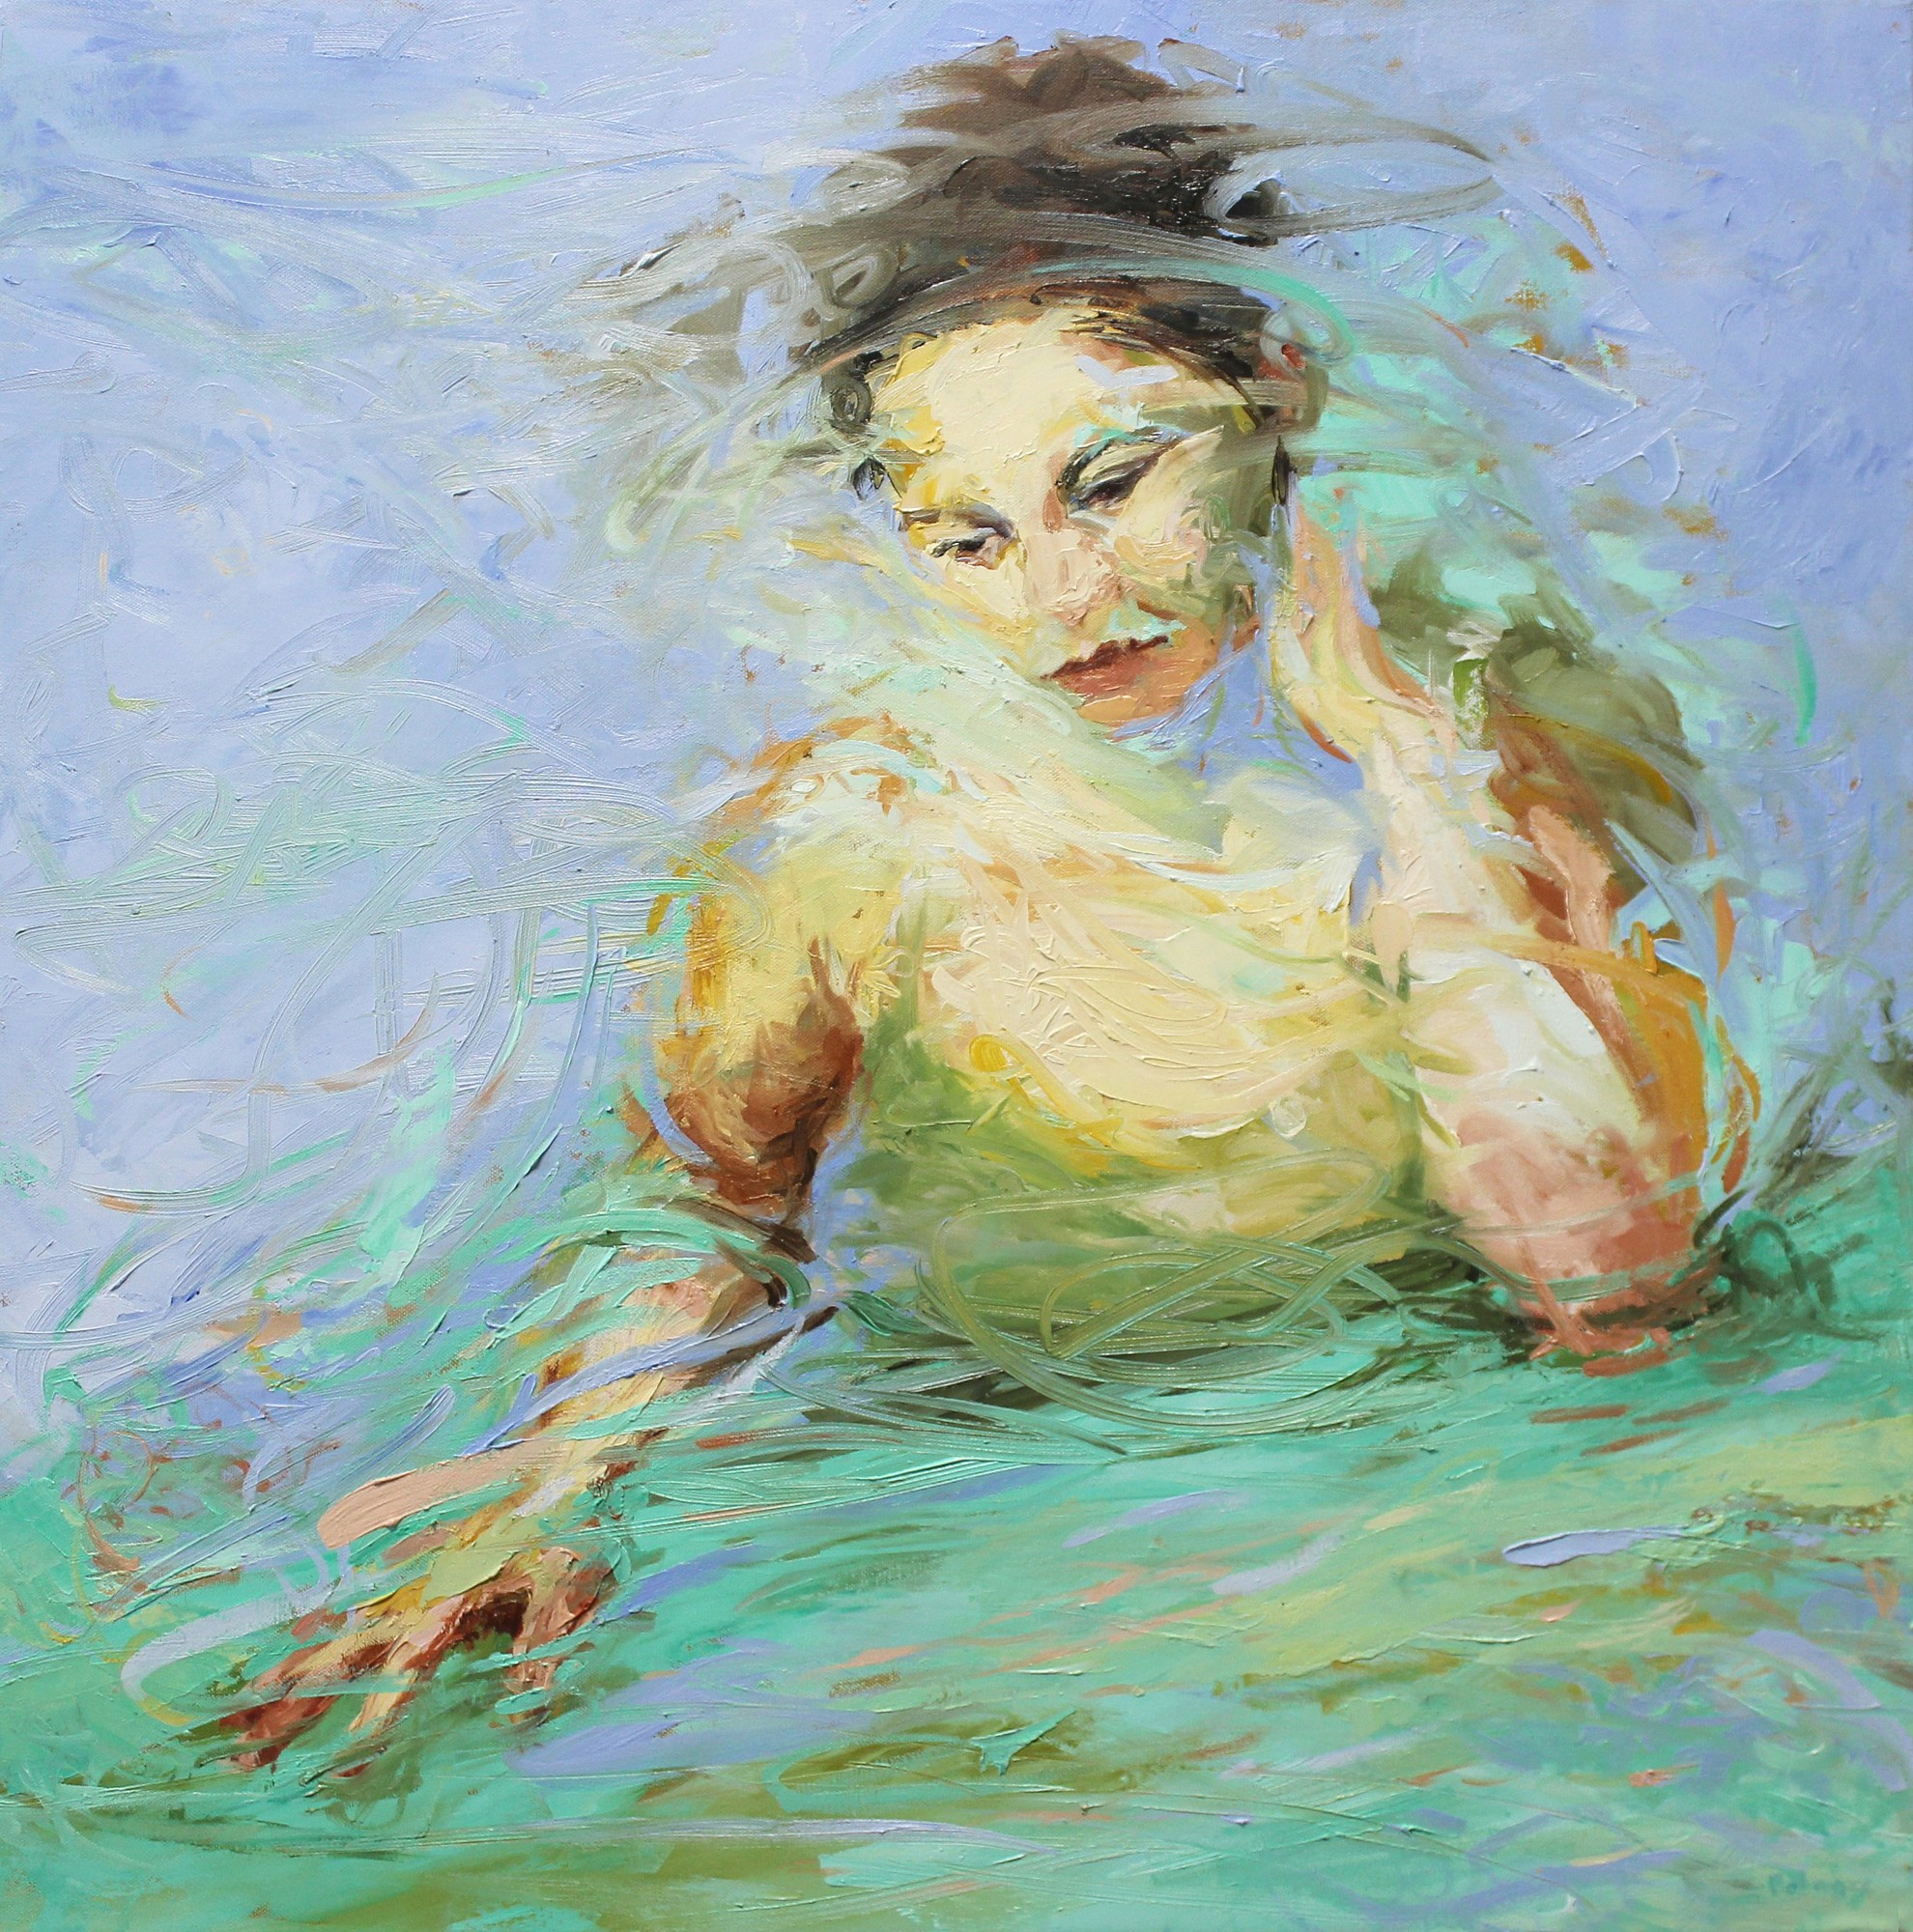 Joyce Polance